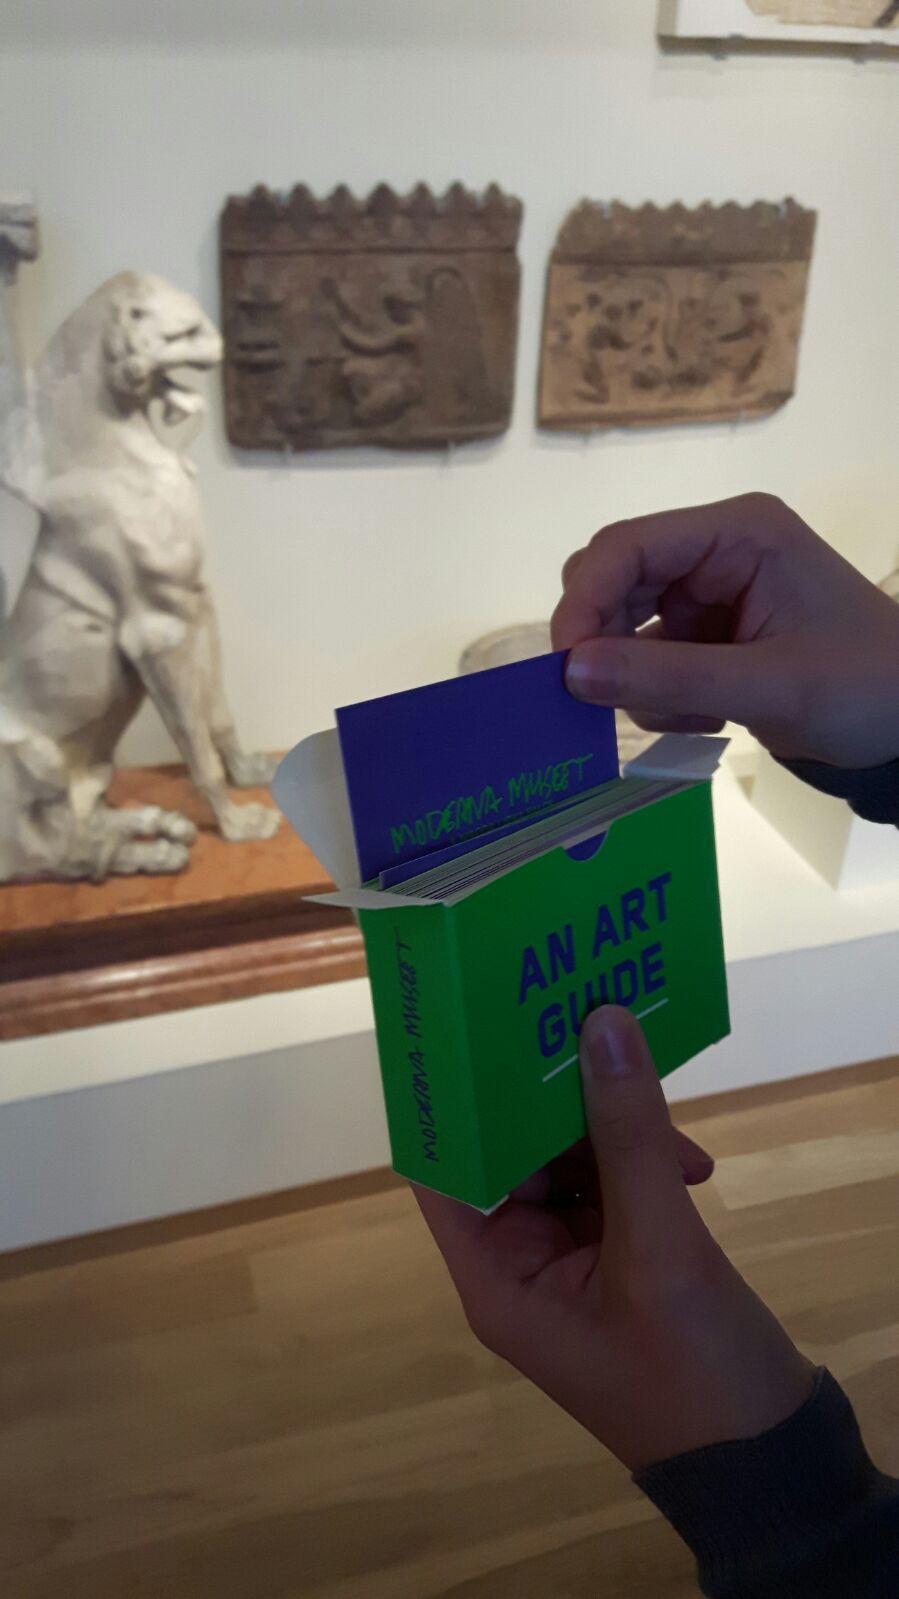 Anywhere Art Guide, De Museumpodcast